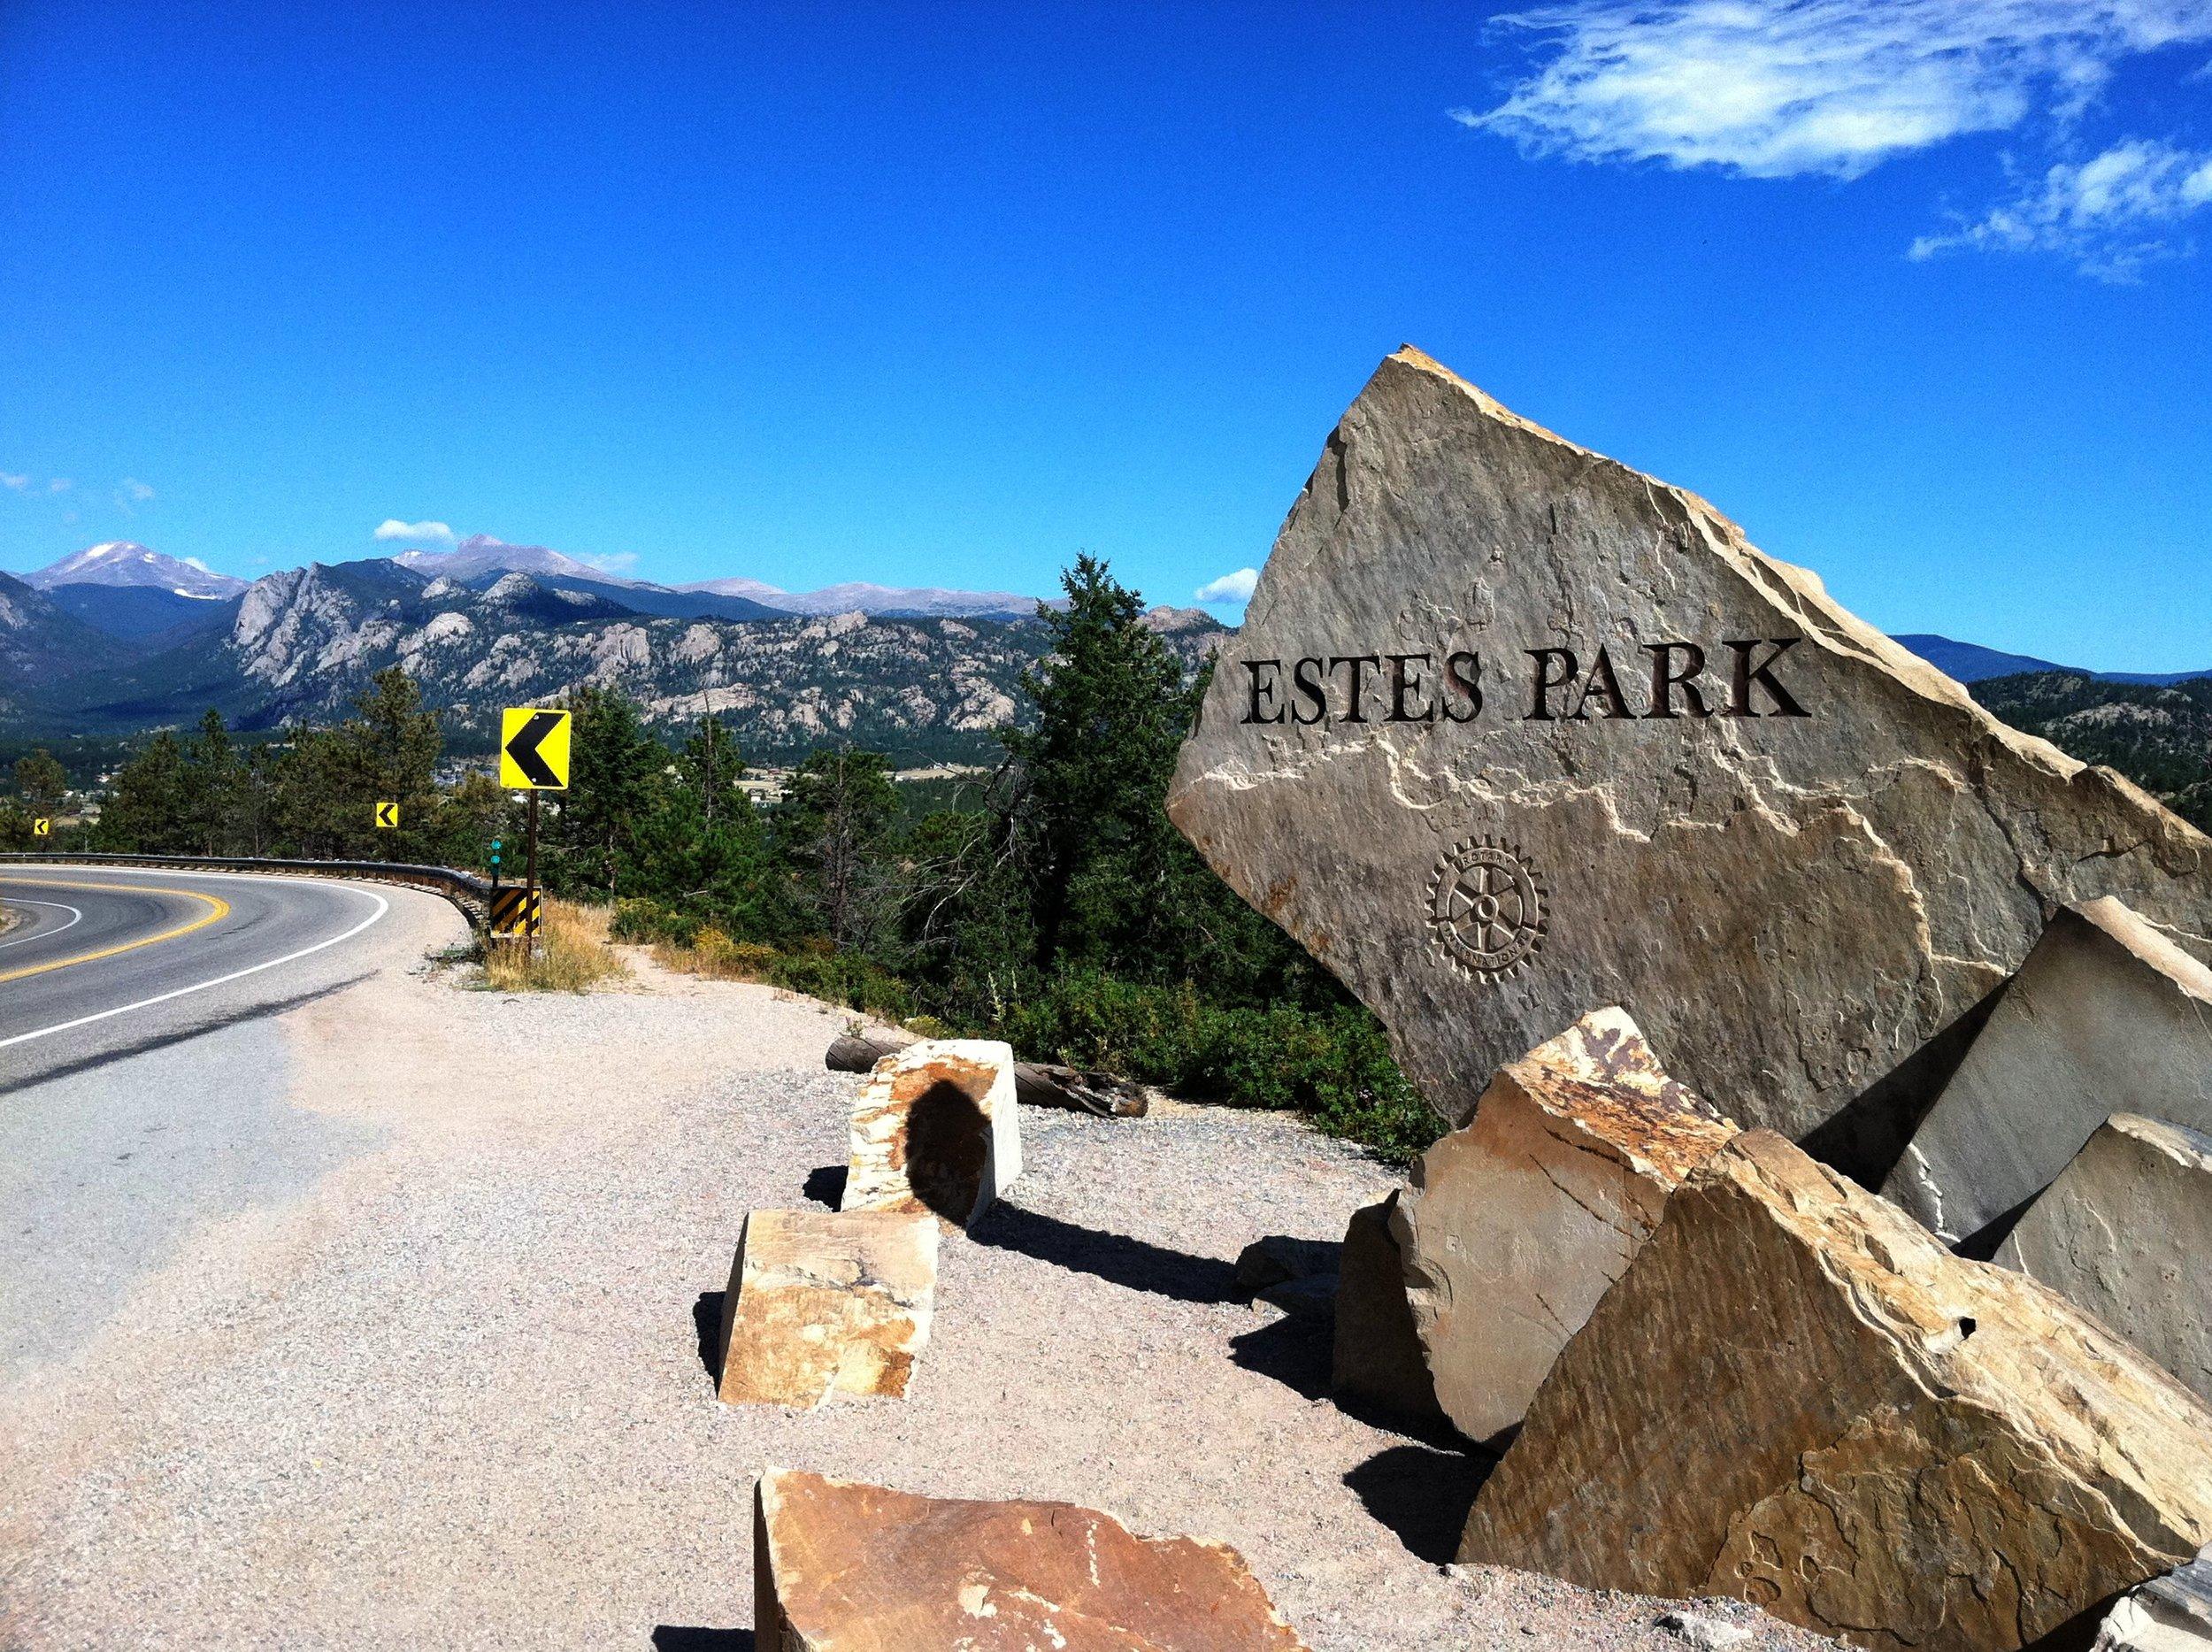 """Estes Park Sign"" cc image courtesy of Mr.Tindc on FLICKR"